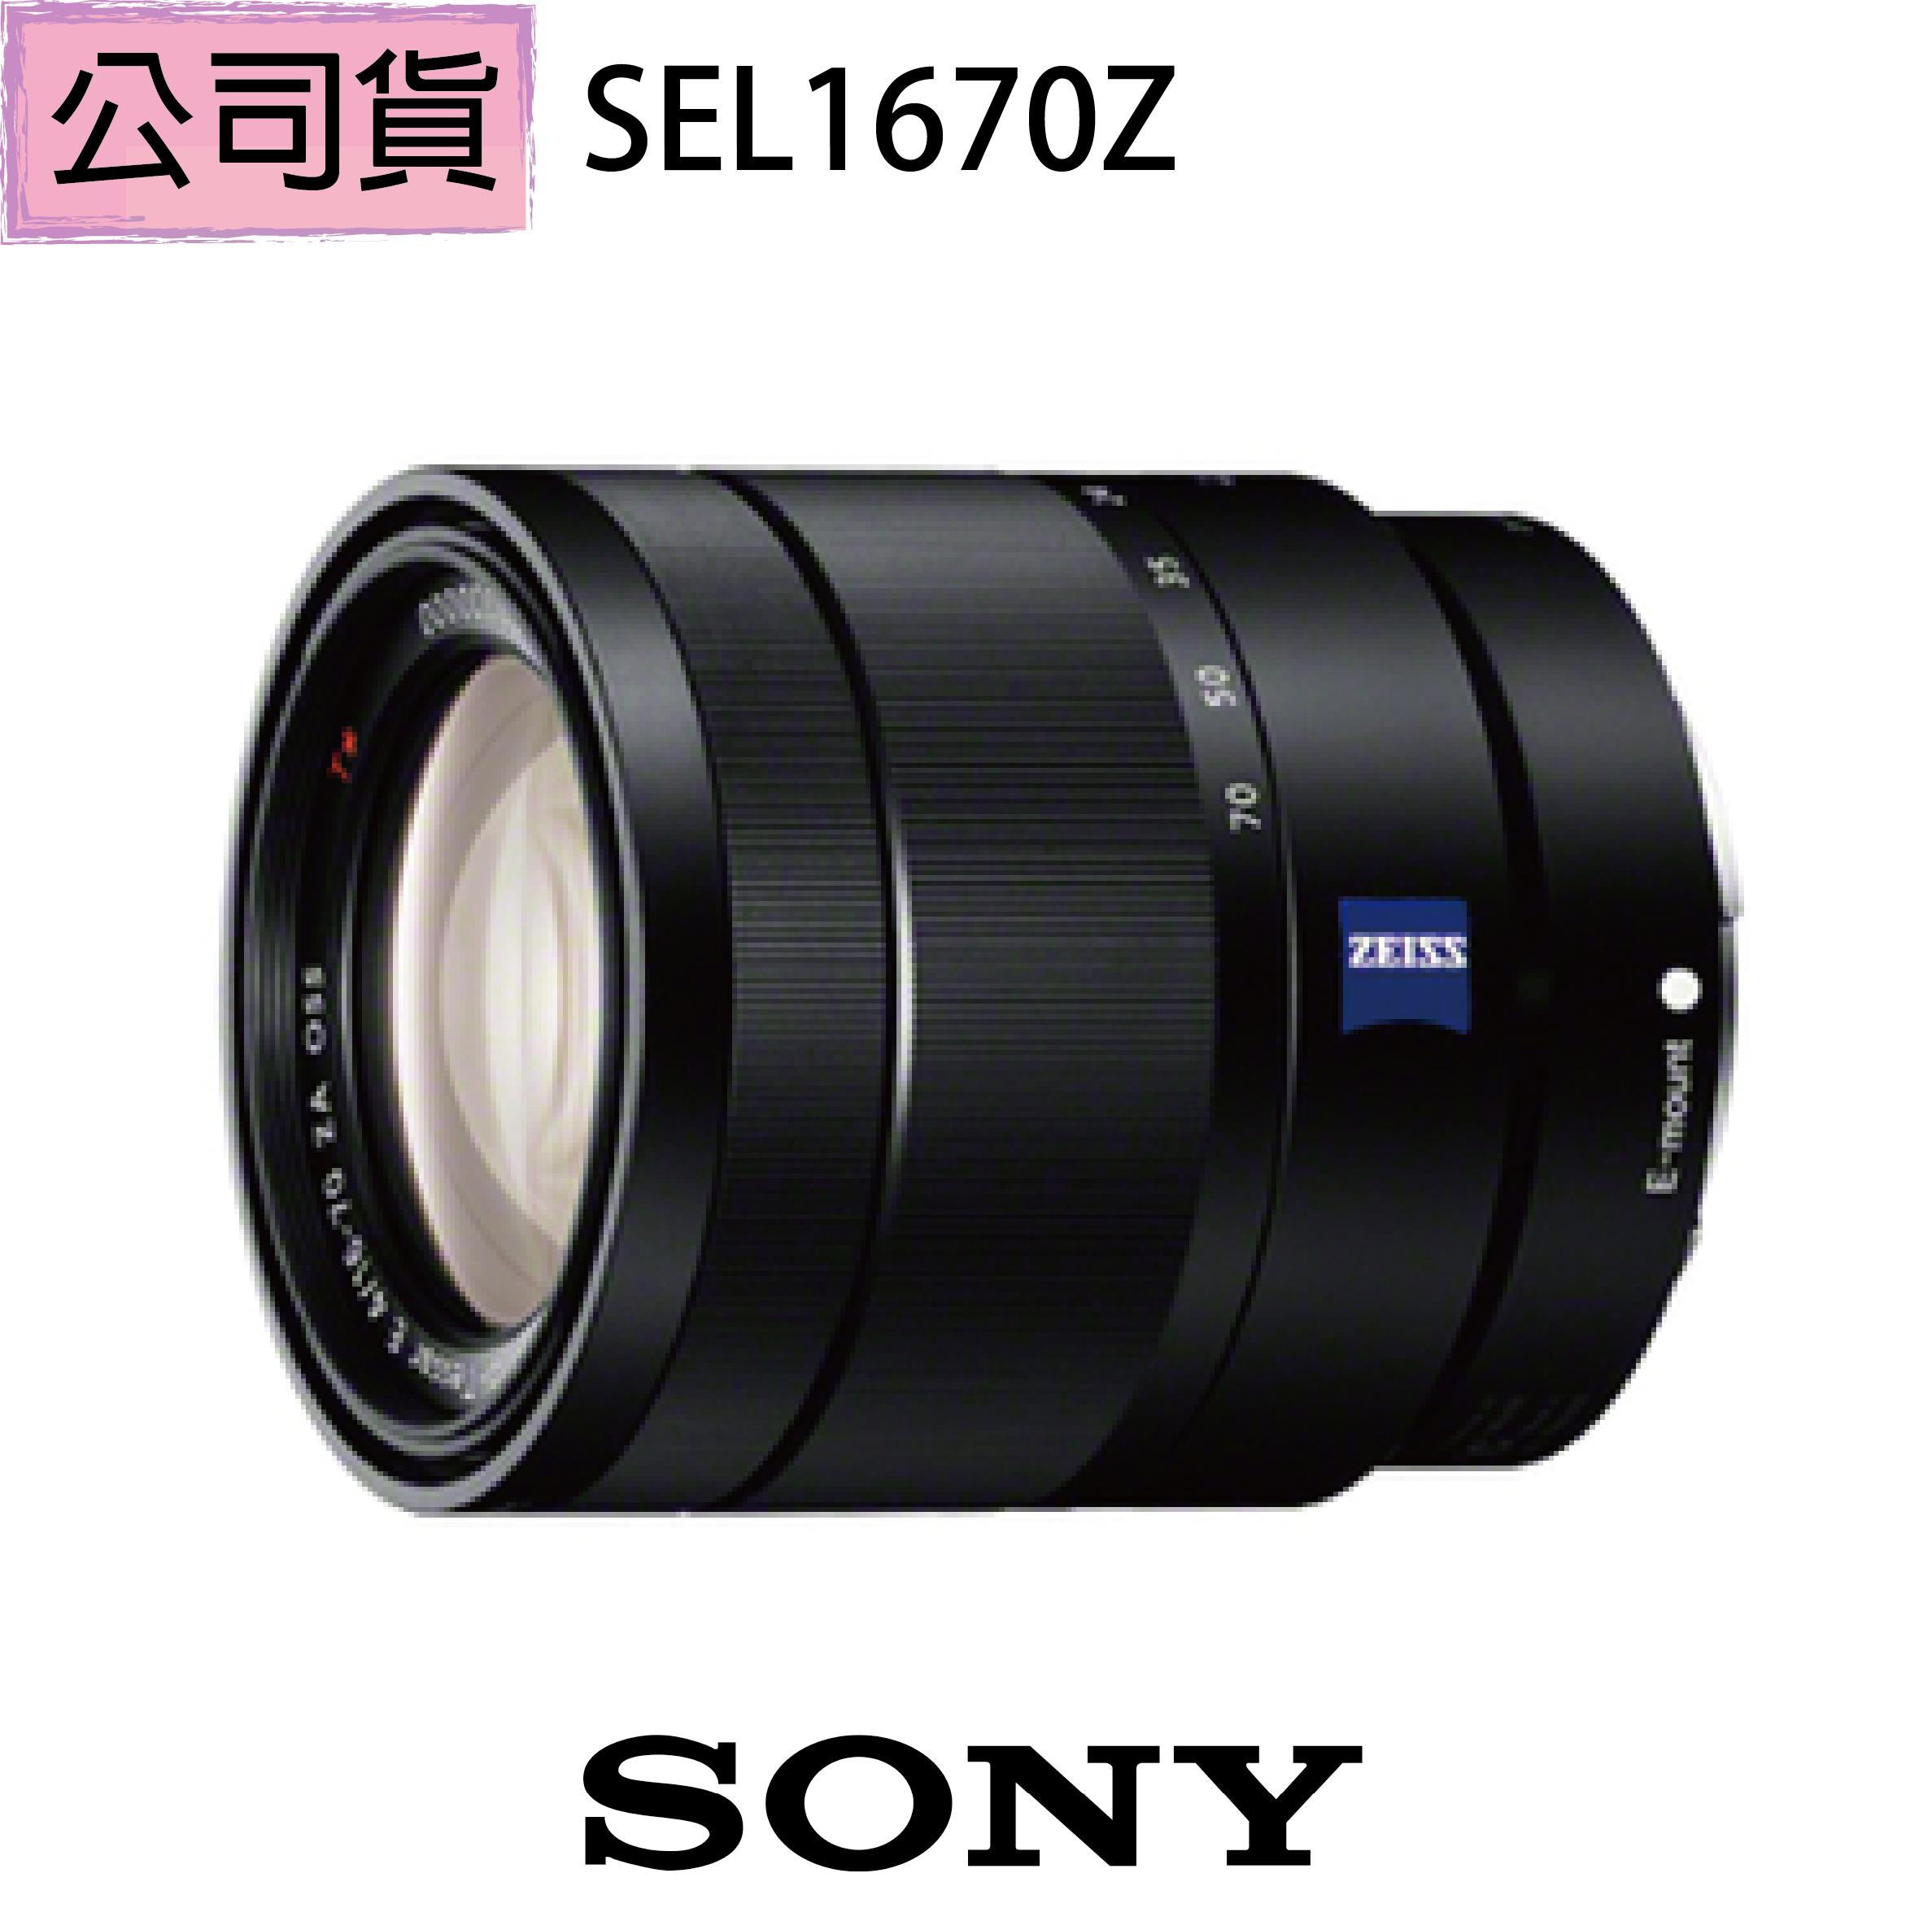 【SONY】SEL1670Z 恆定光圈變焦鏡 (公司貨)